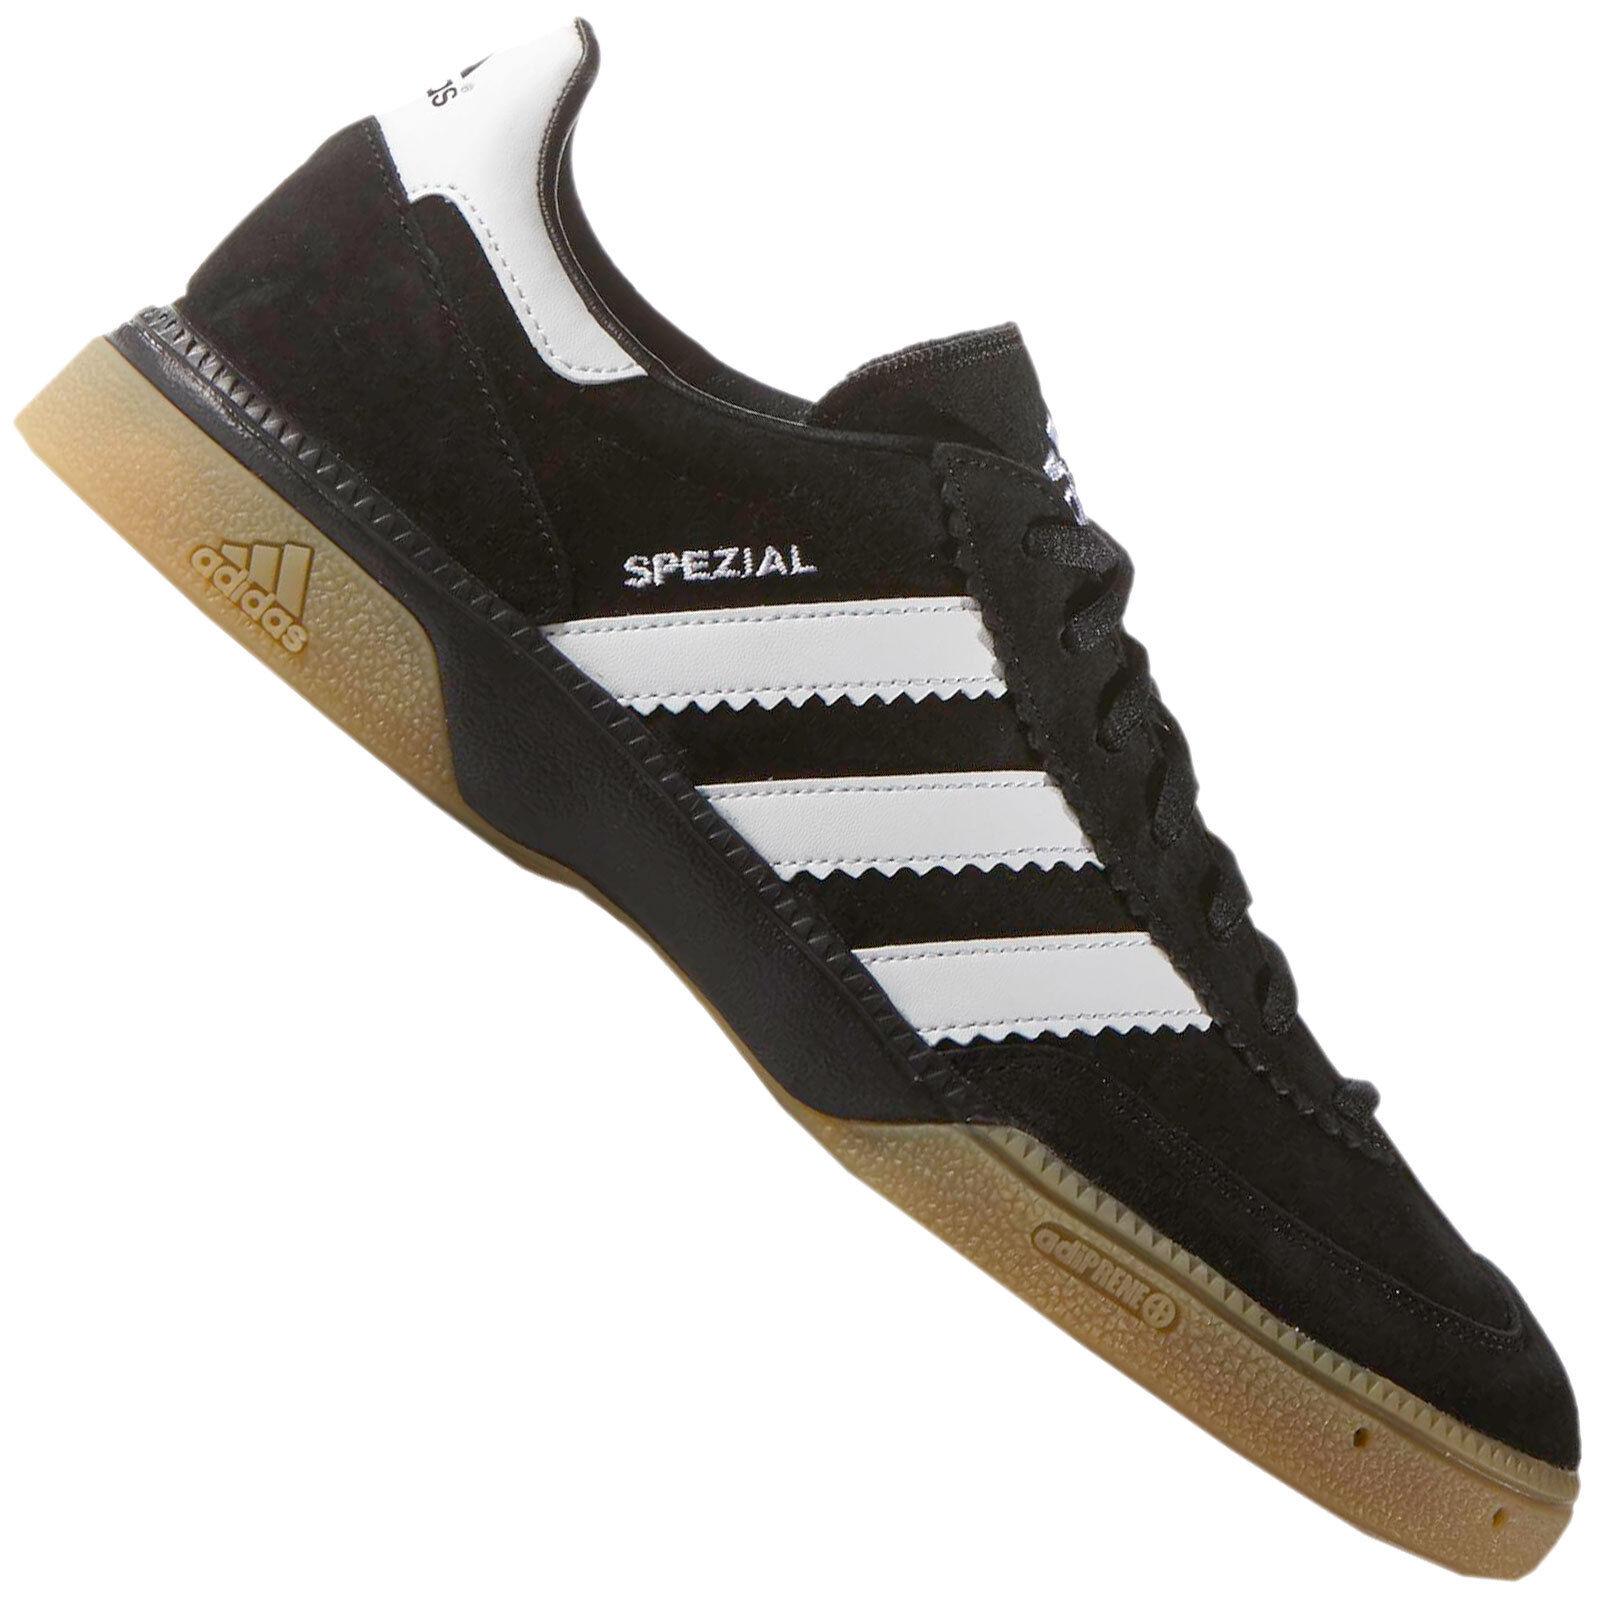 adidas Performance Spezial Handball-Schuhe Sportschuhe Turnschuhe Herren-Sneaker